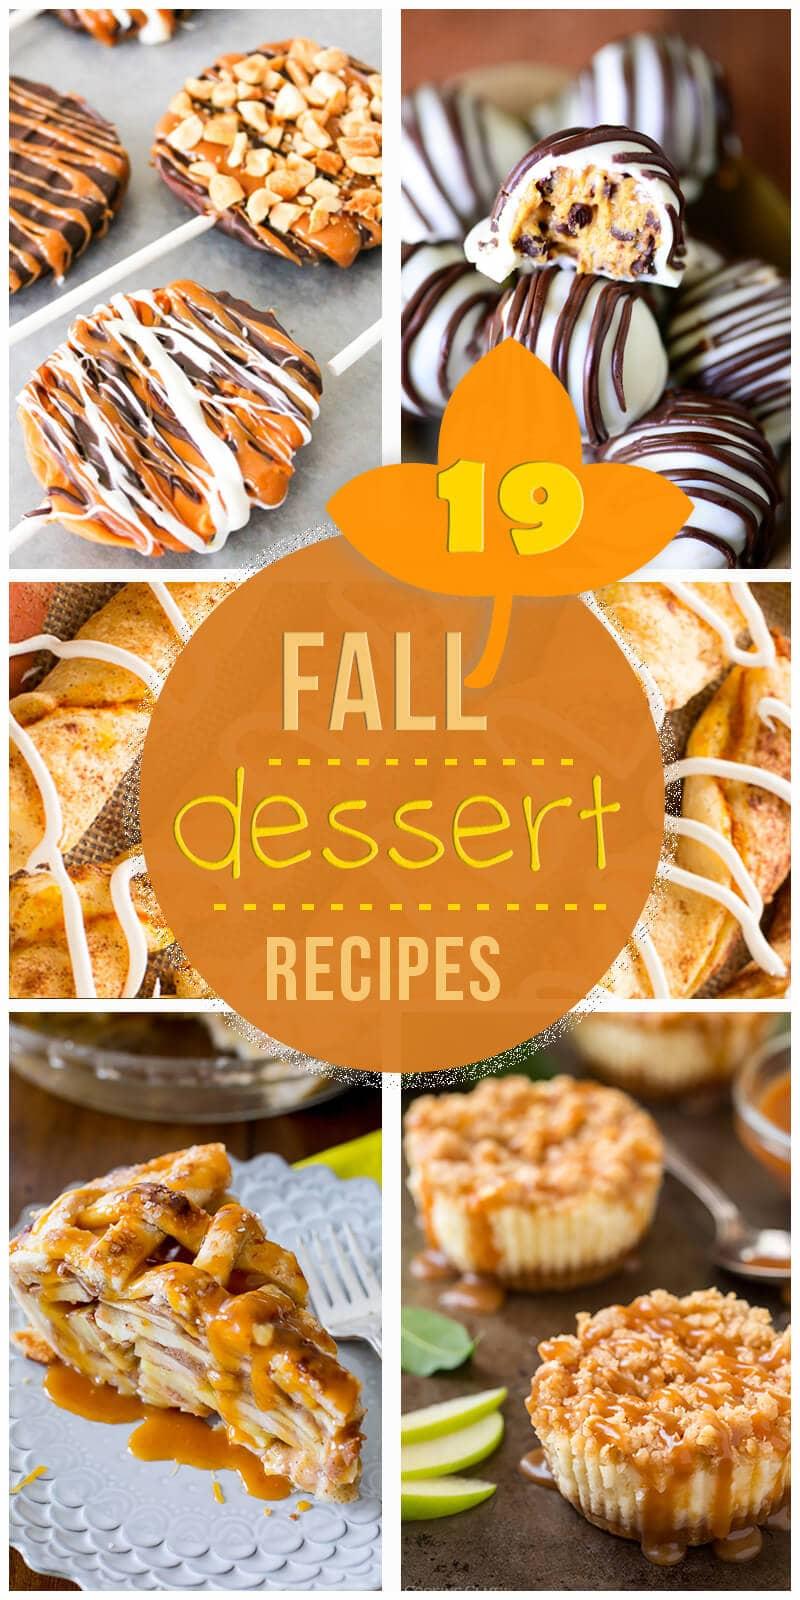 19 Soul-Satisfying Fall Dessert Recipes